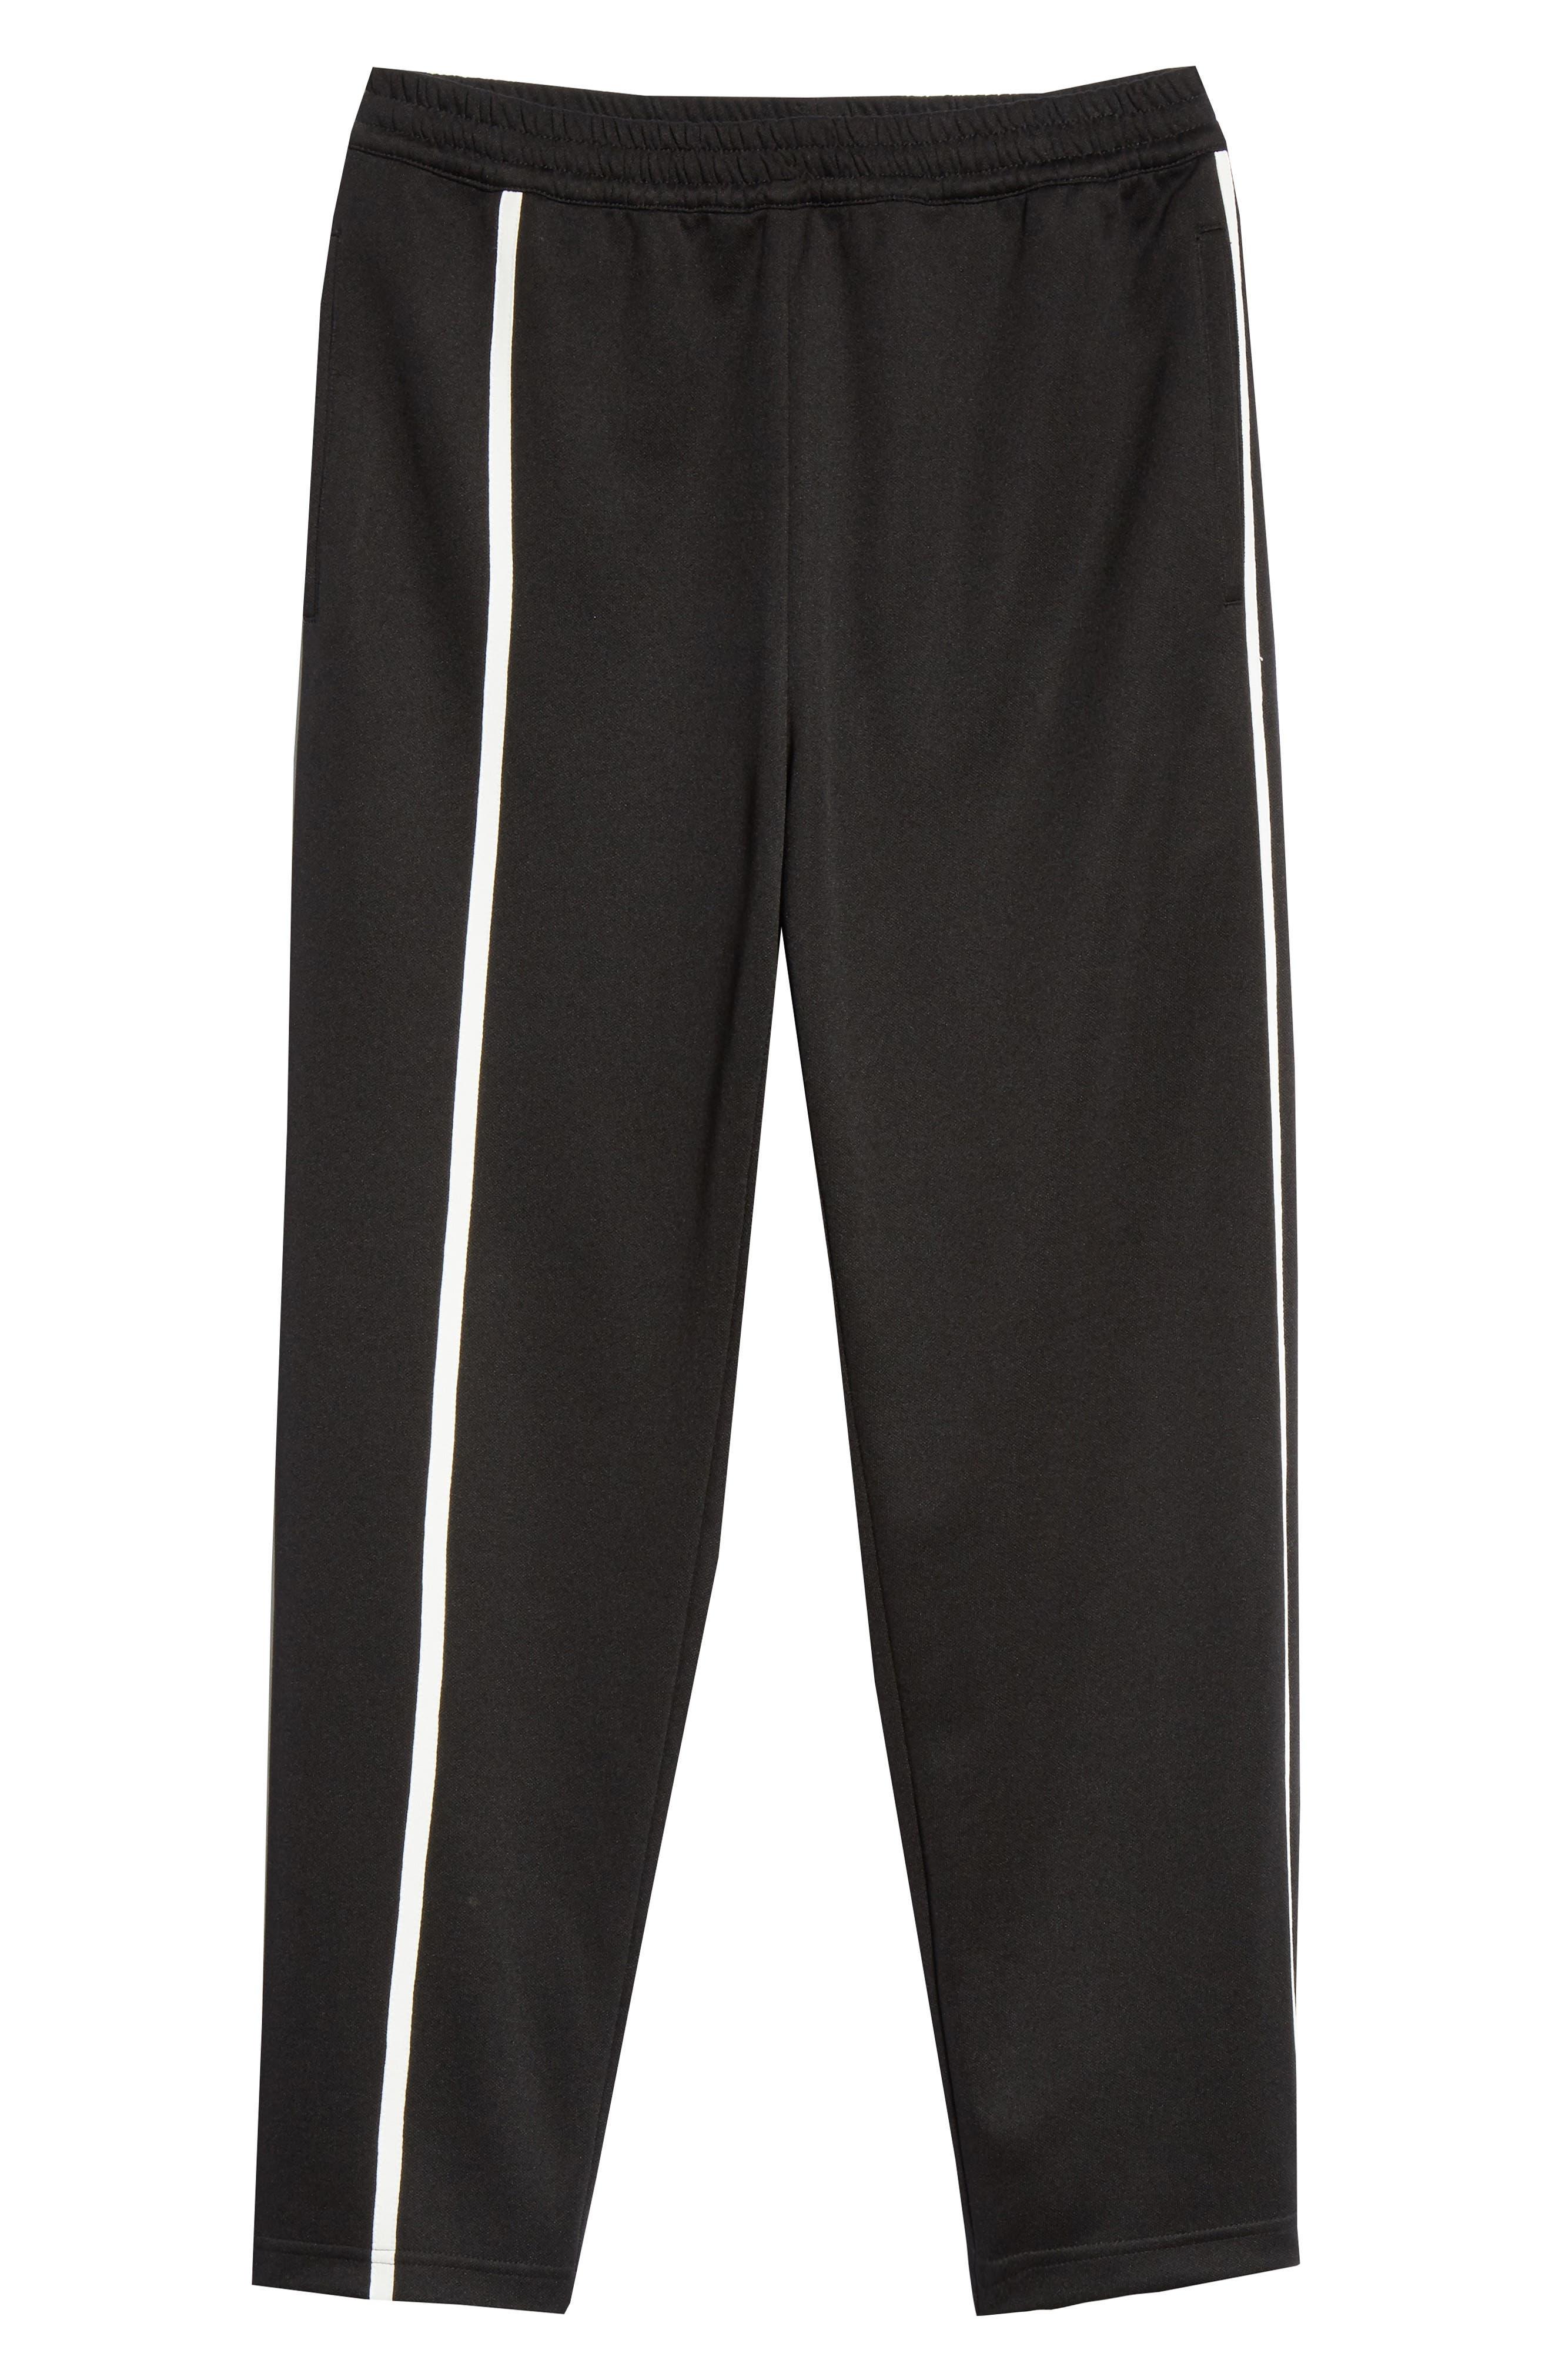 HELMUT LANG, Sport Stripe Sweatpants, Alternate thumbnail 6, color, BLACK AND WHITE